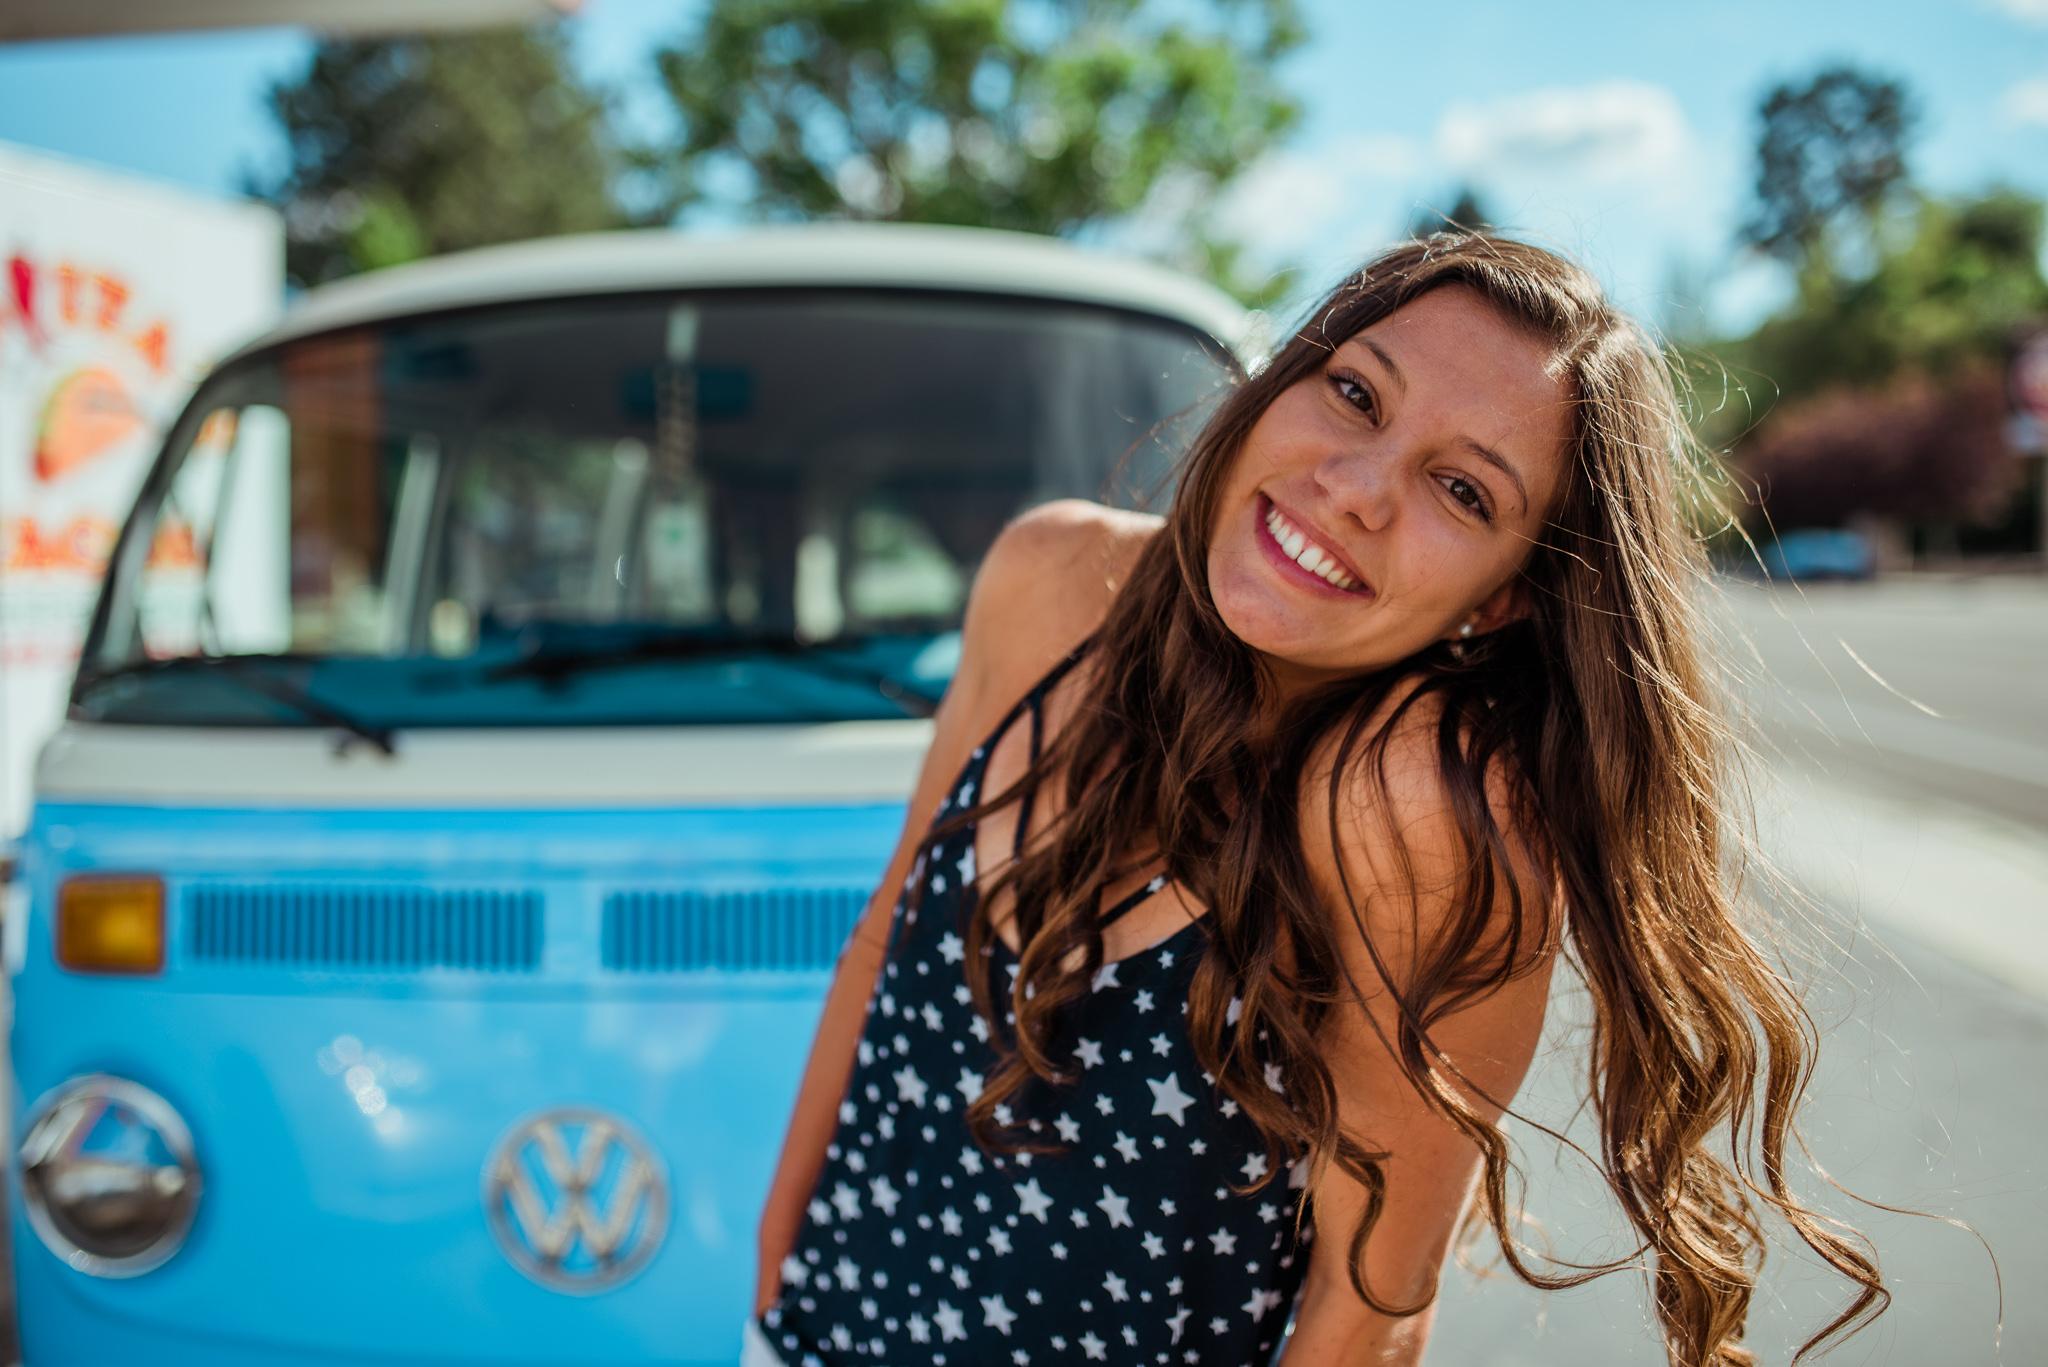 Boise Senior Photographer // Idaho // graduation // Boise // natural posing // laughter // flowers // senior girl posing // VW Bus // retro aesthetic // fun senior pictures // summer vibes // summer photos // summer // SS Photography & Design // Sadie Shirts